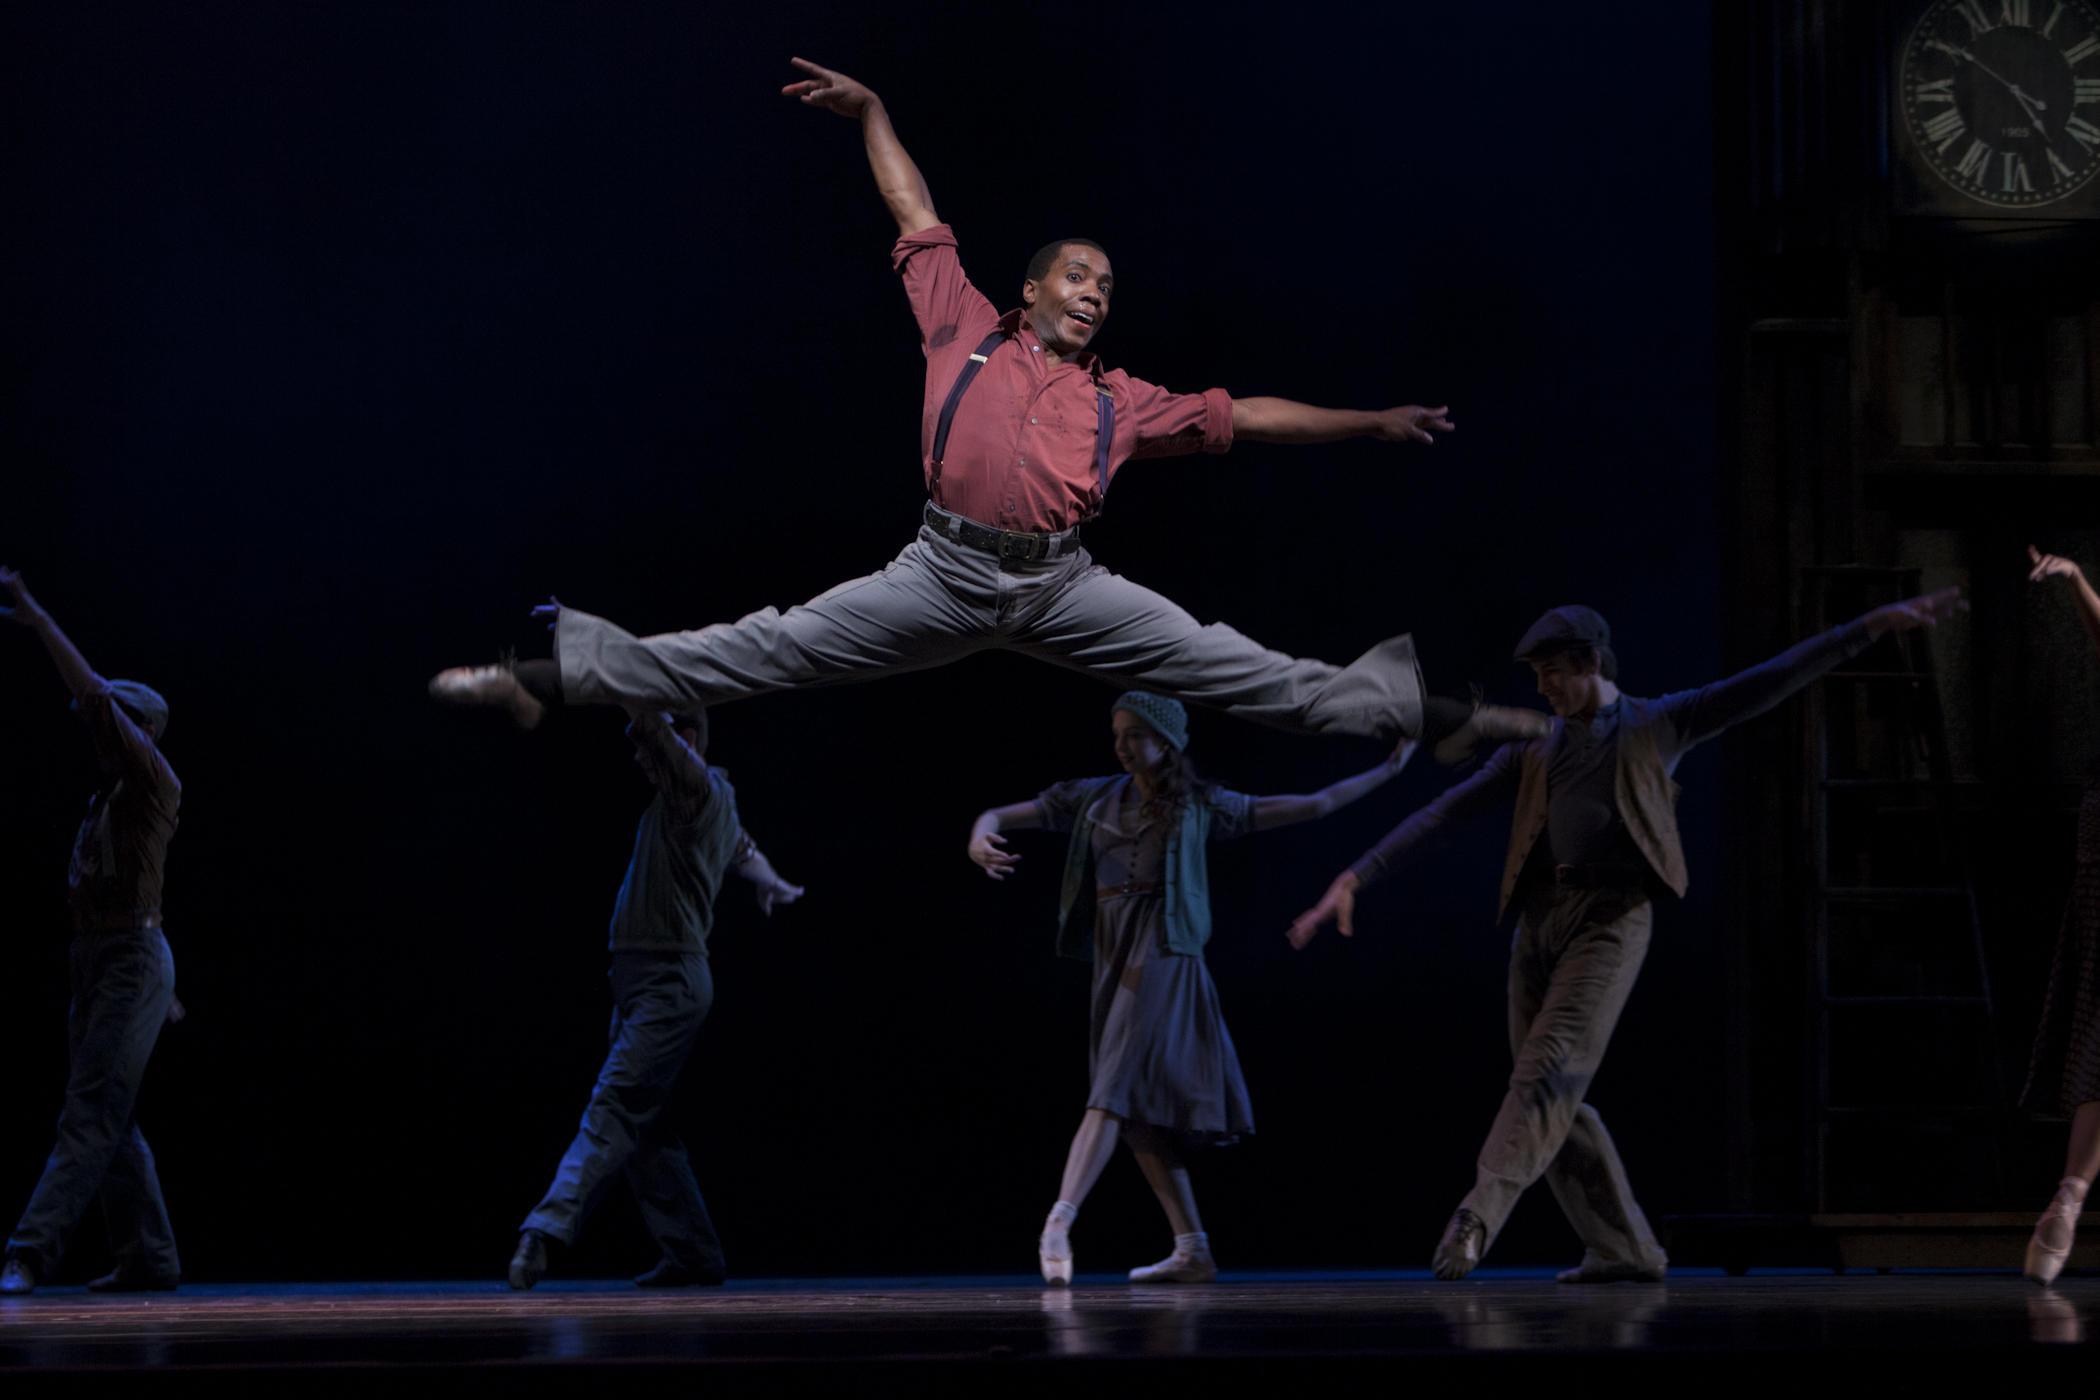 Kiyon Gaines in Twyla Tharps' Waiting At The Station. Photo © Lindsay Thomas.